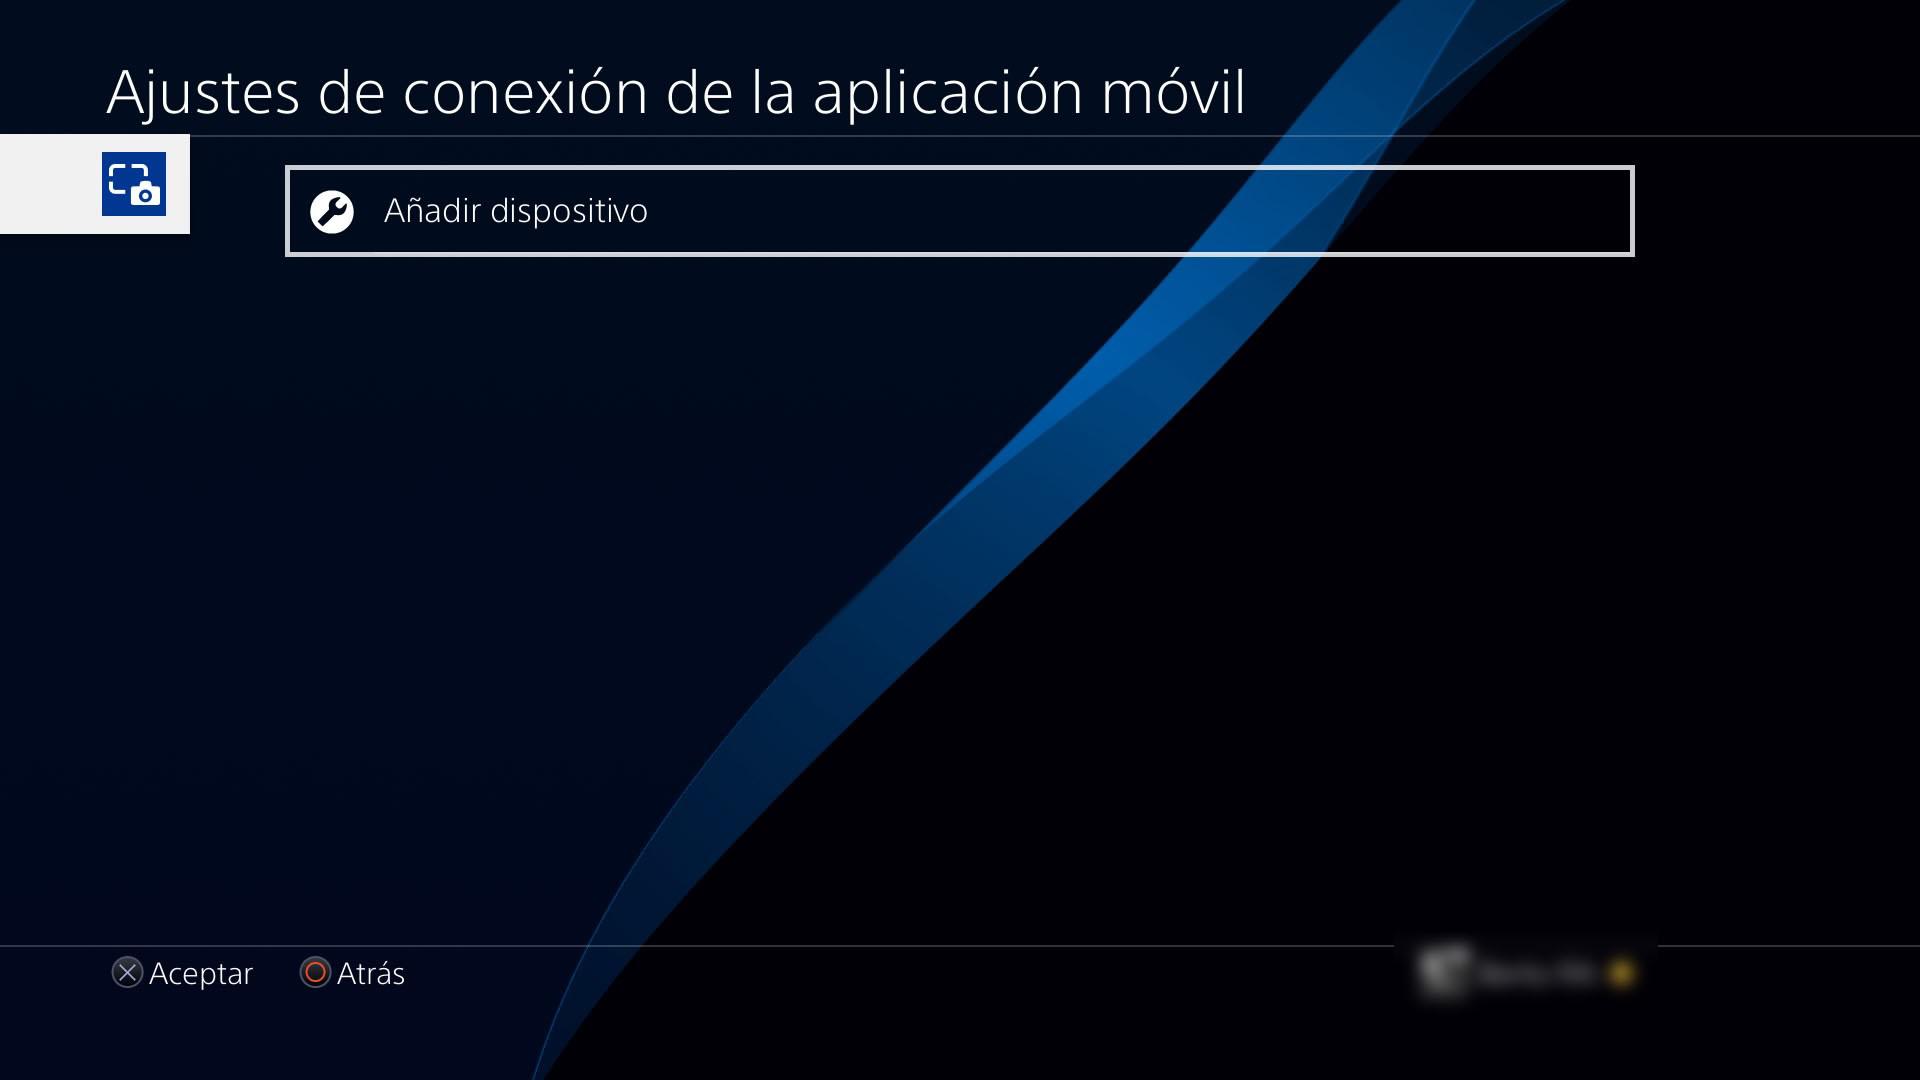 playstation 4 en Android